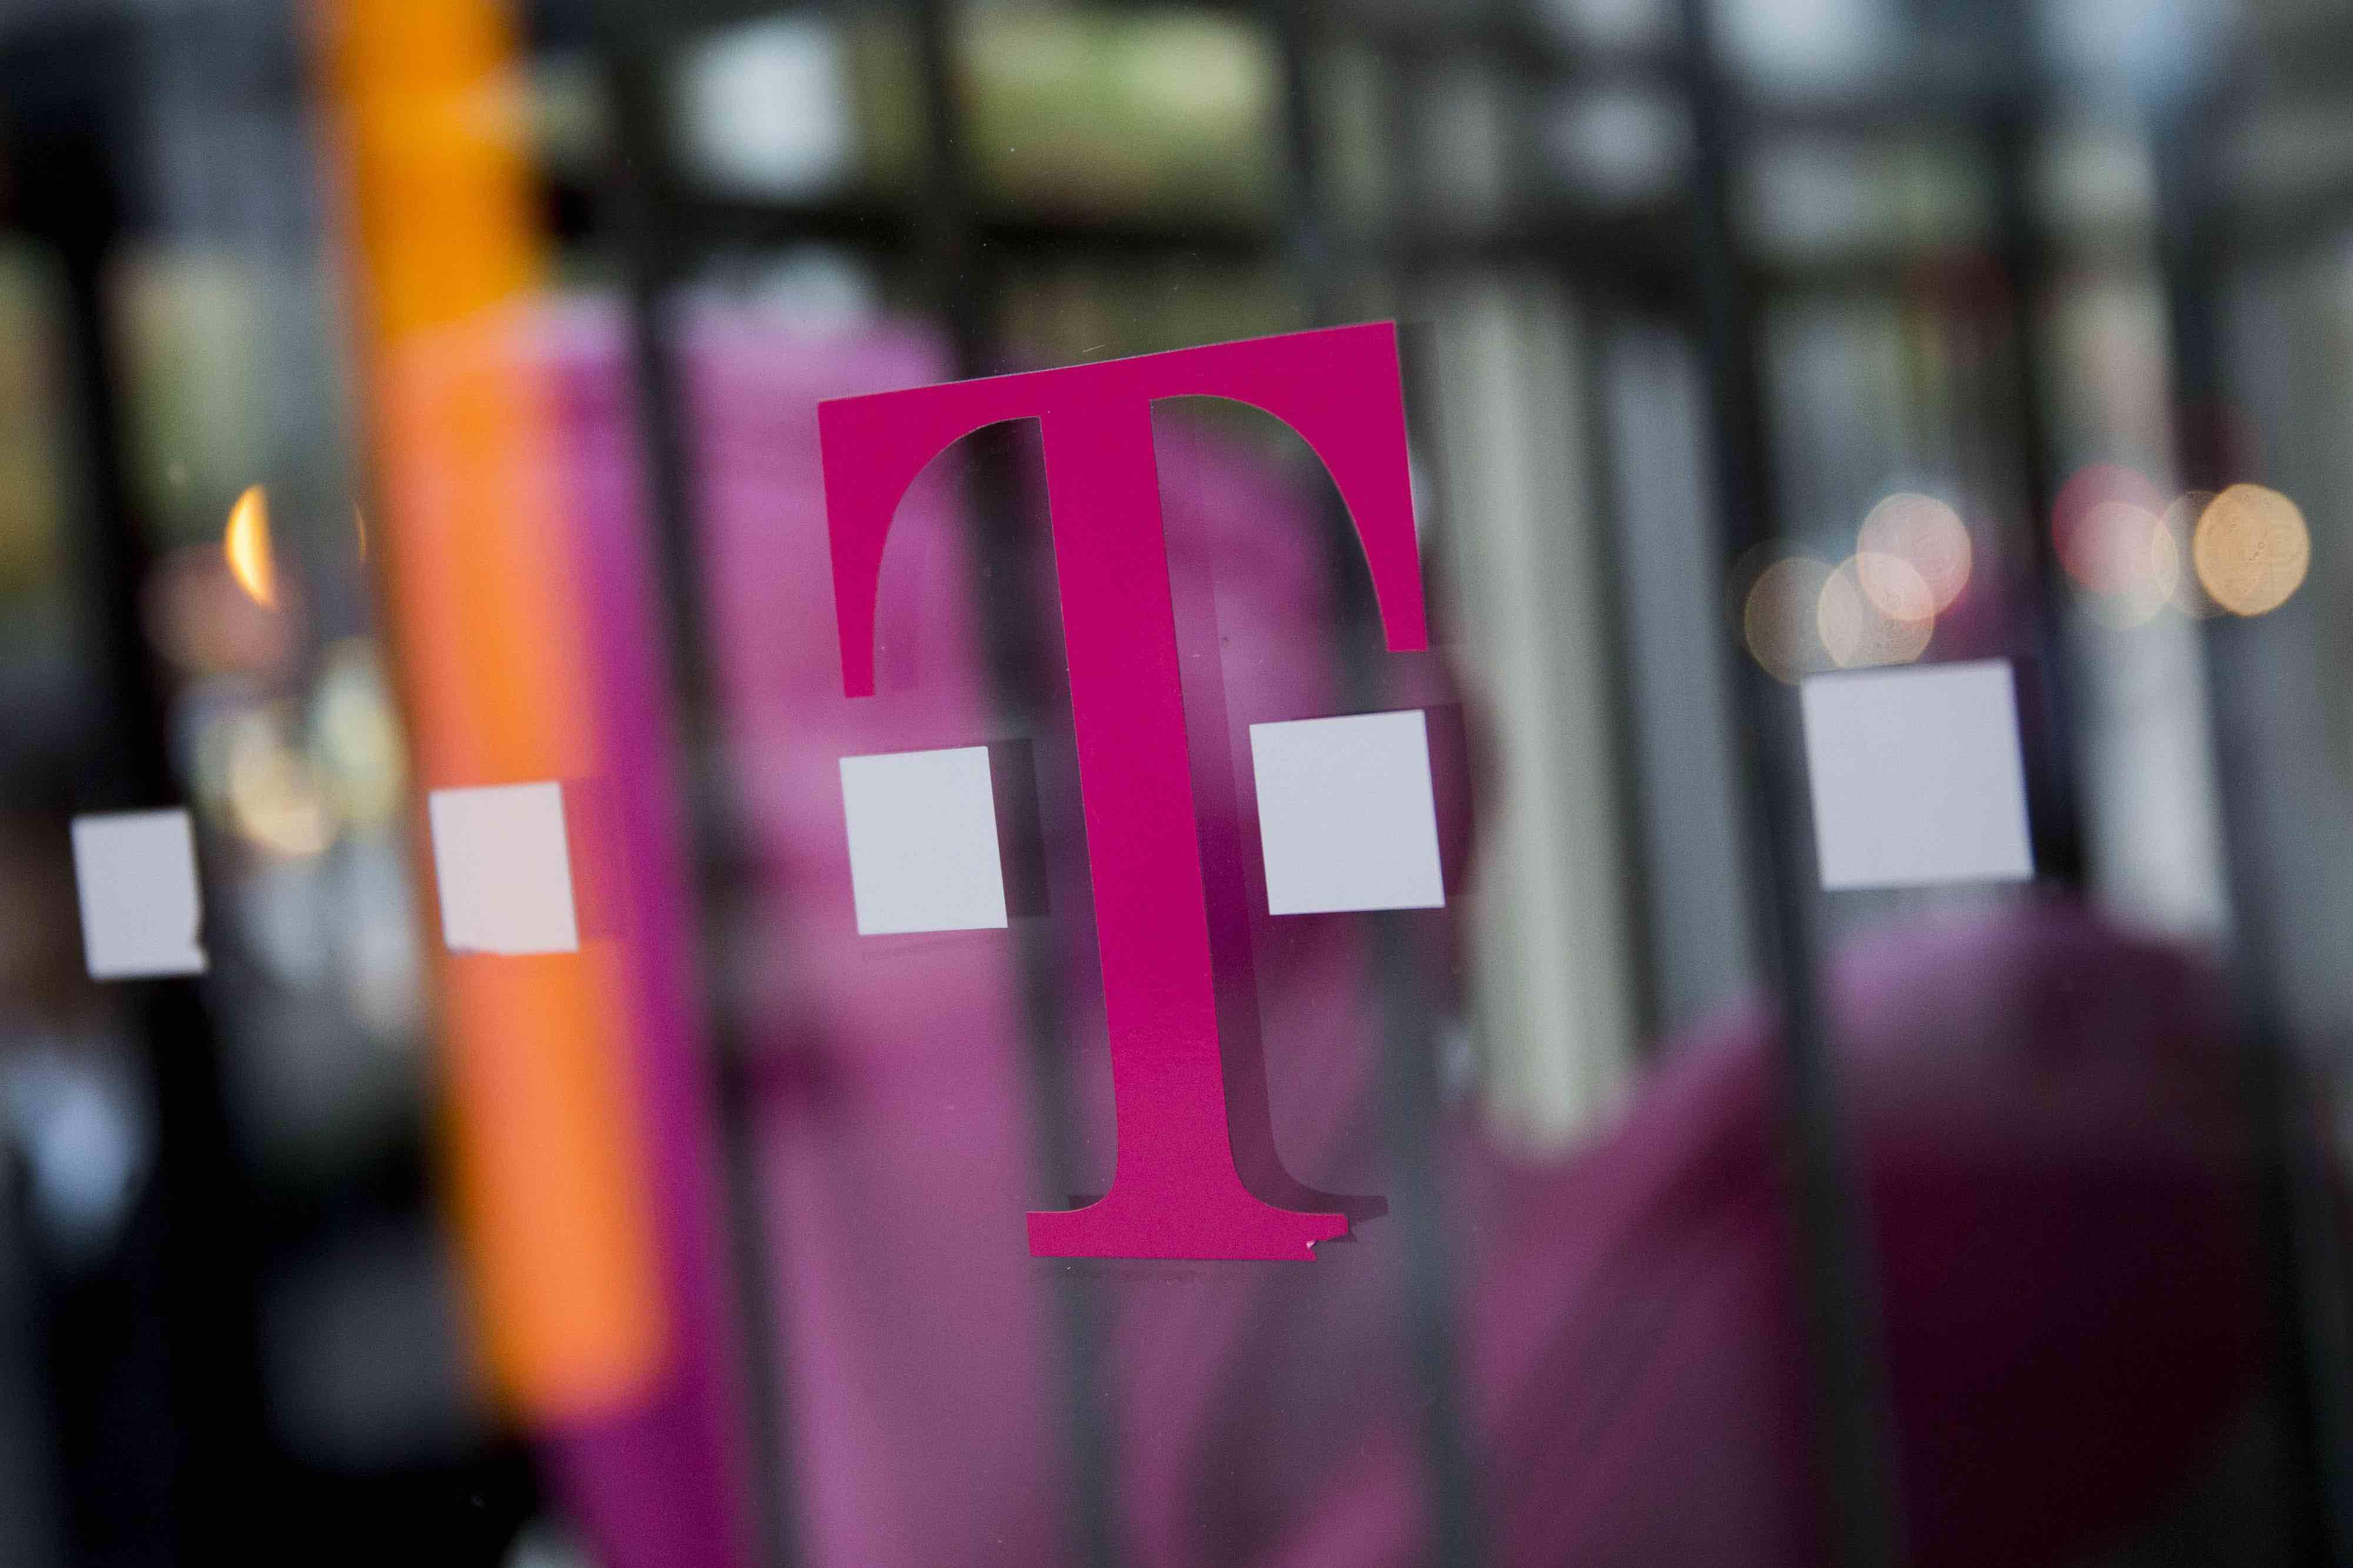 T-Mobile's $50 home Internet service has no data cap, but